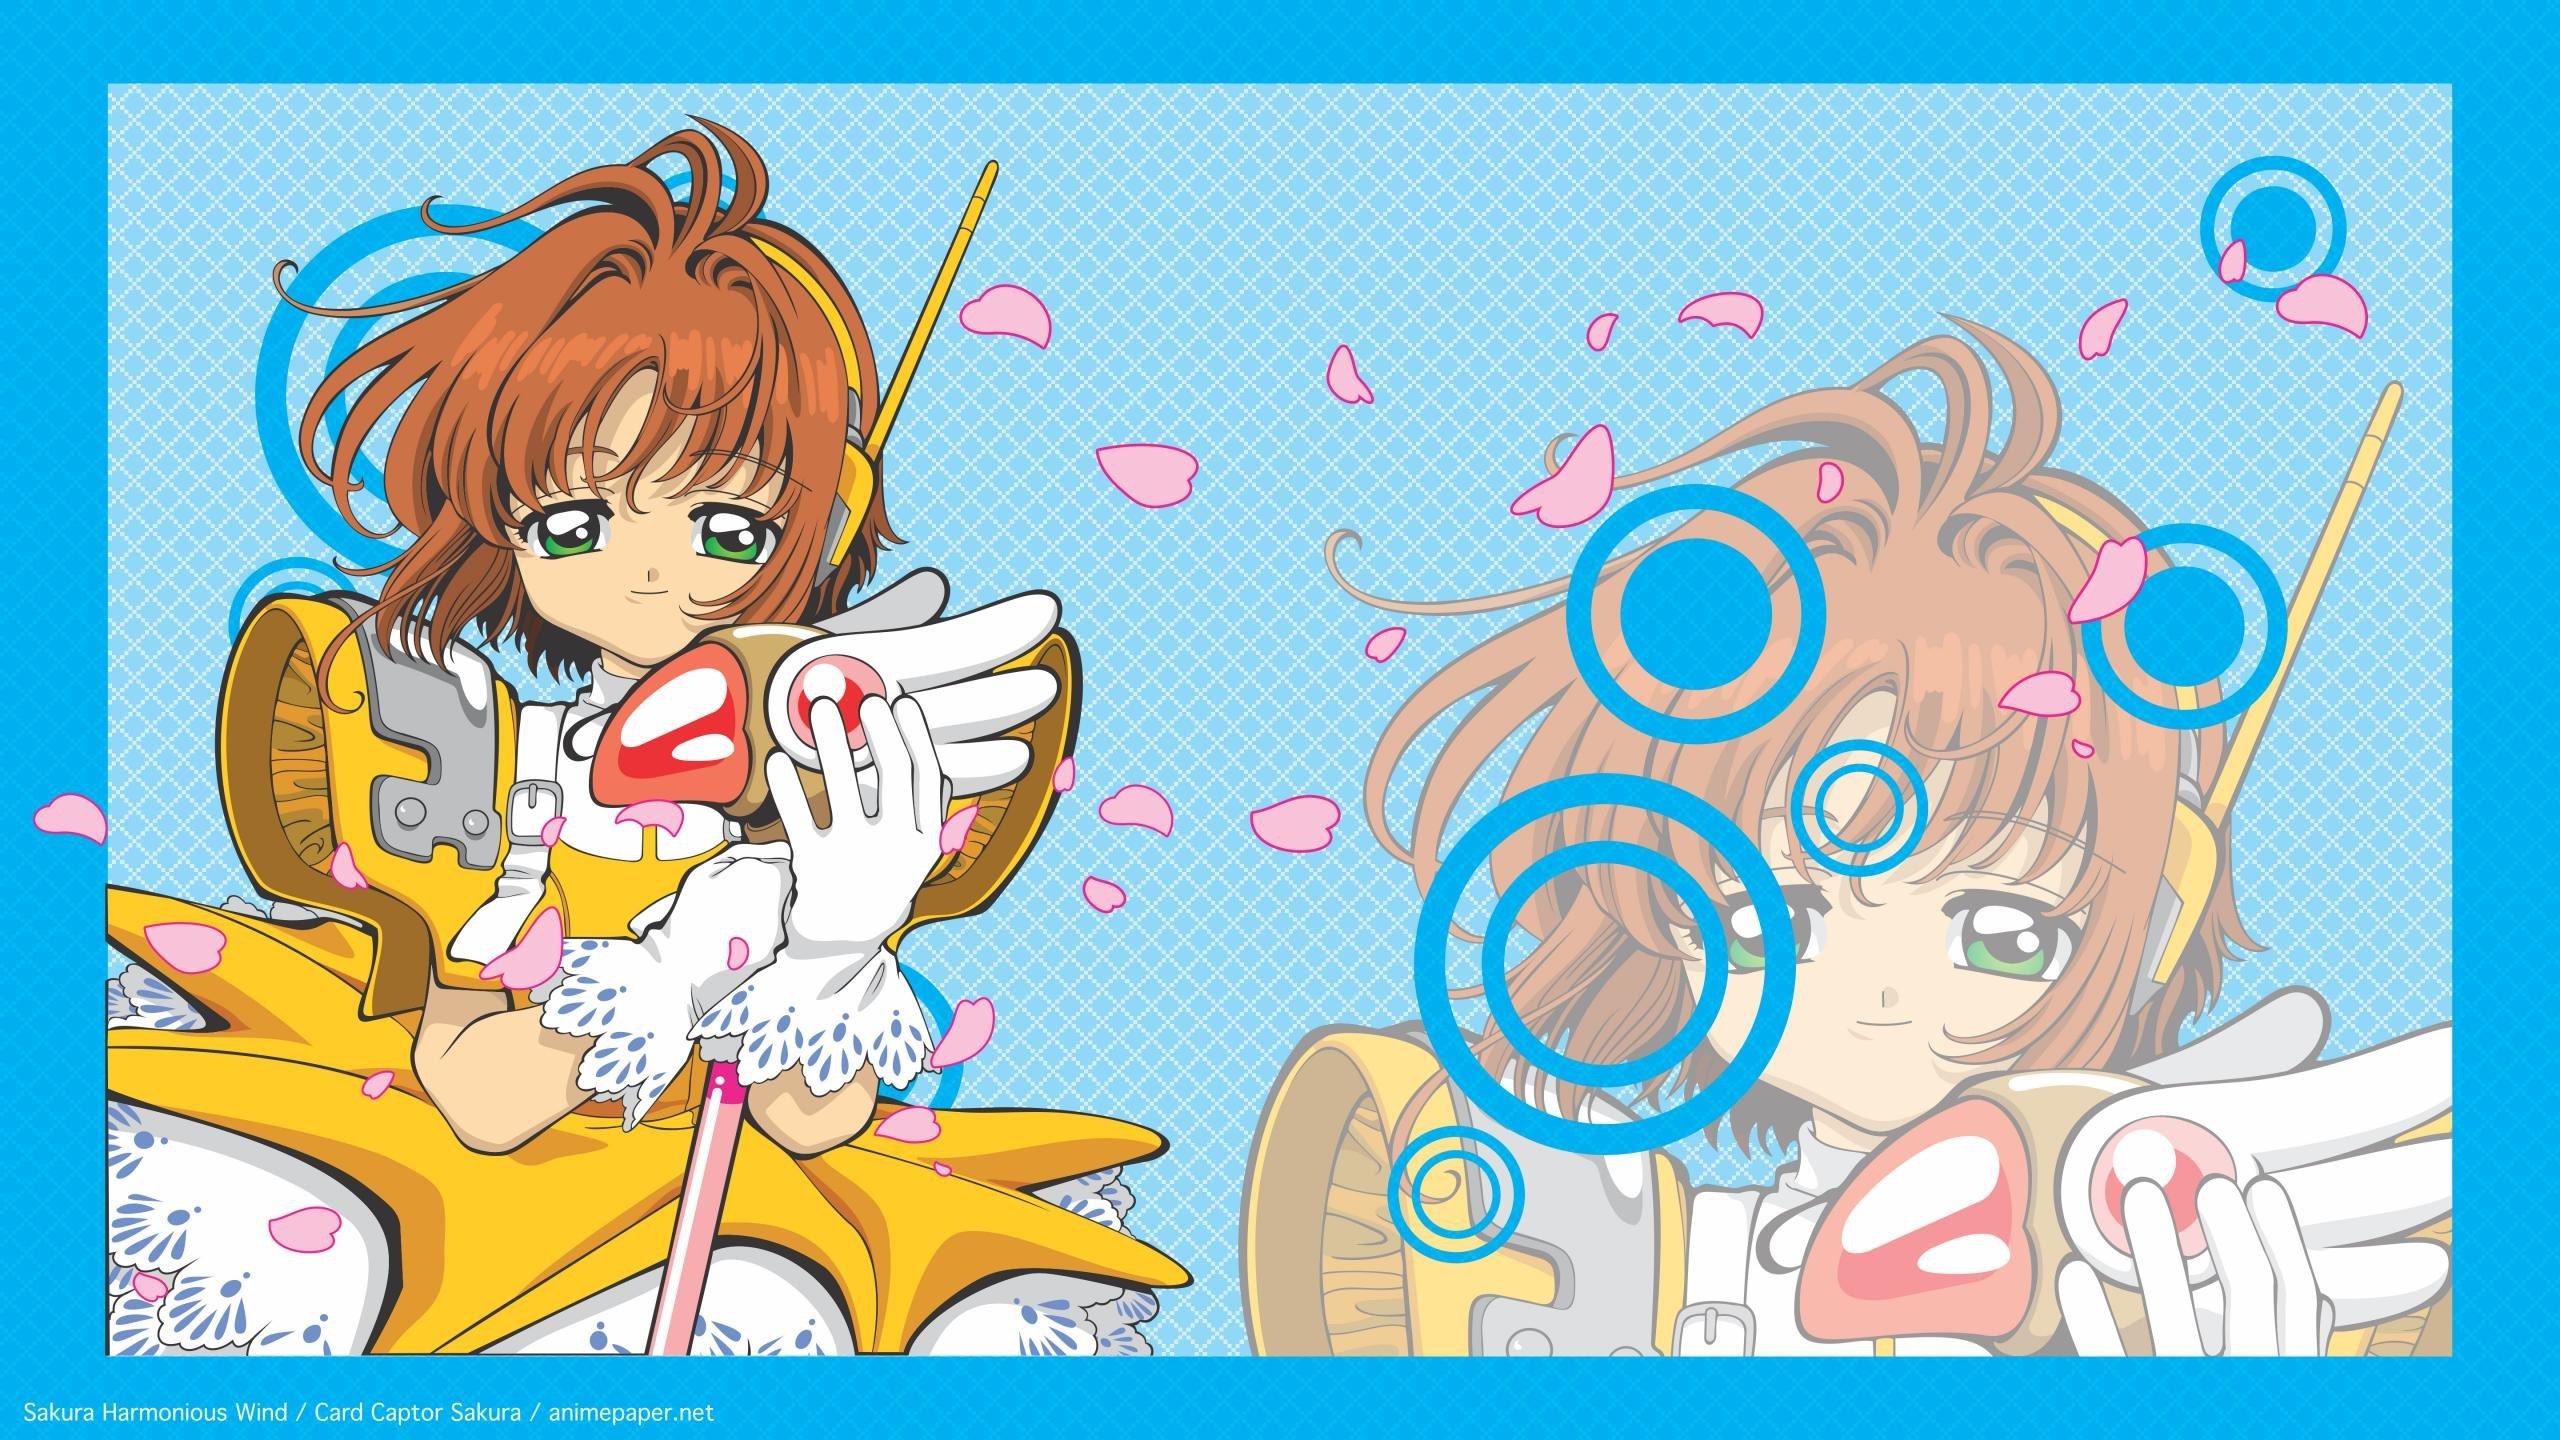 Cardcaptor sakura wallpapers 2560x1440 desktop backgrounds - Sakura desktop ...